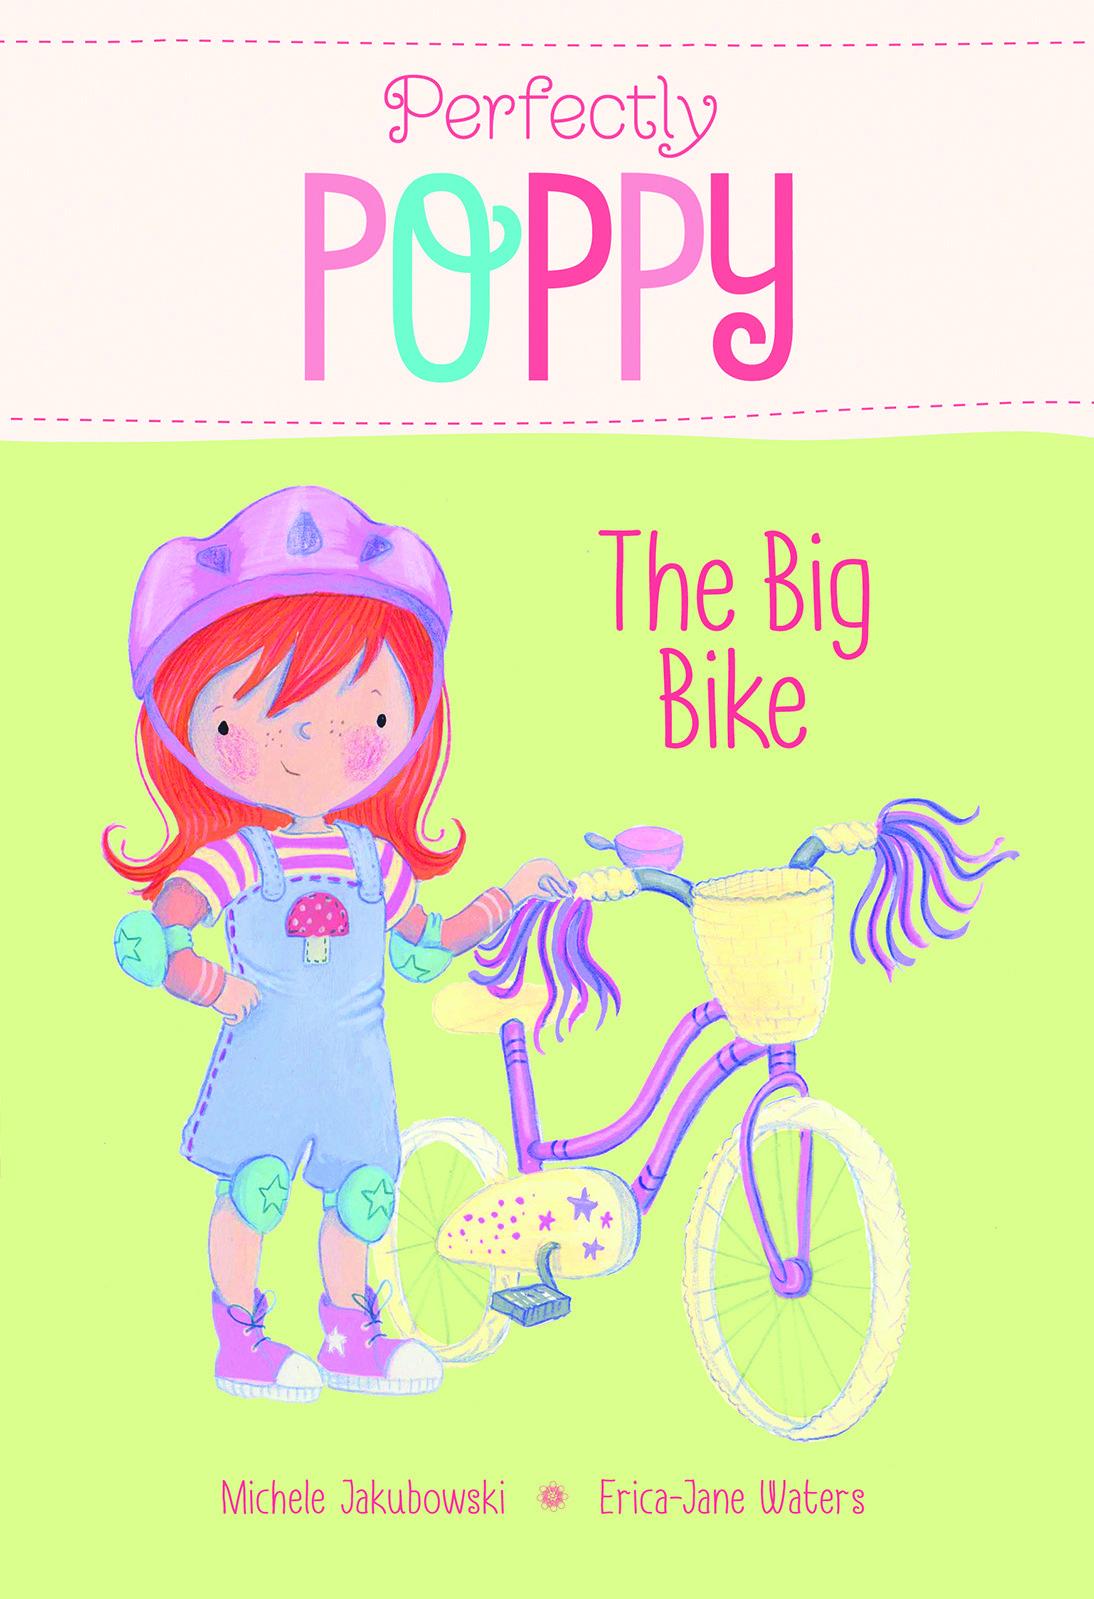 The Big Bike Story by Michele Jakubowski, illustrated by